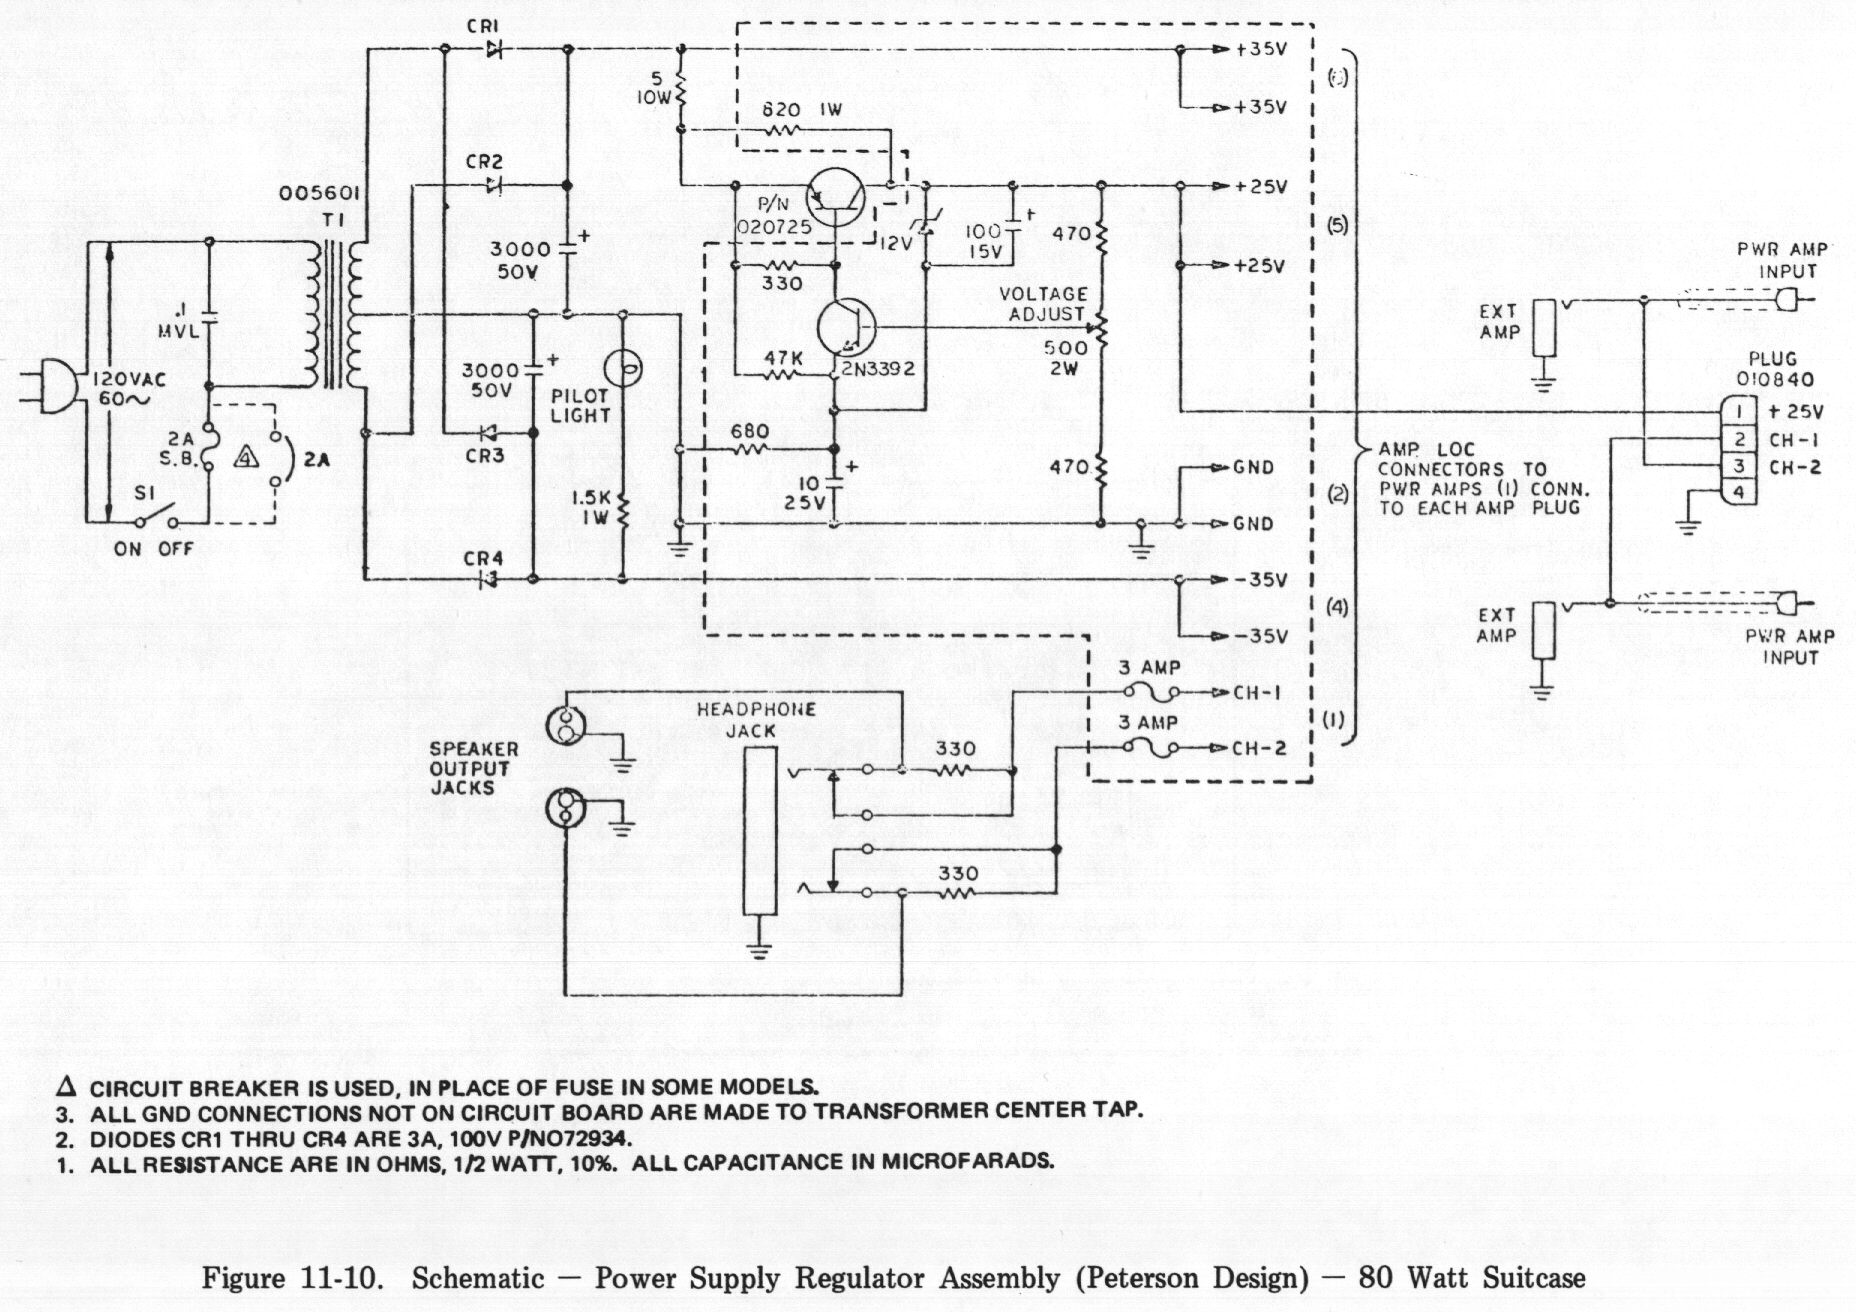 Chapter 11: Diagrams, Schematics and Pictorials